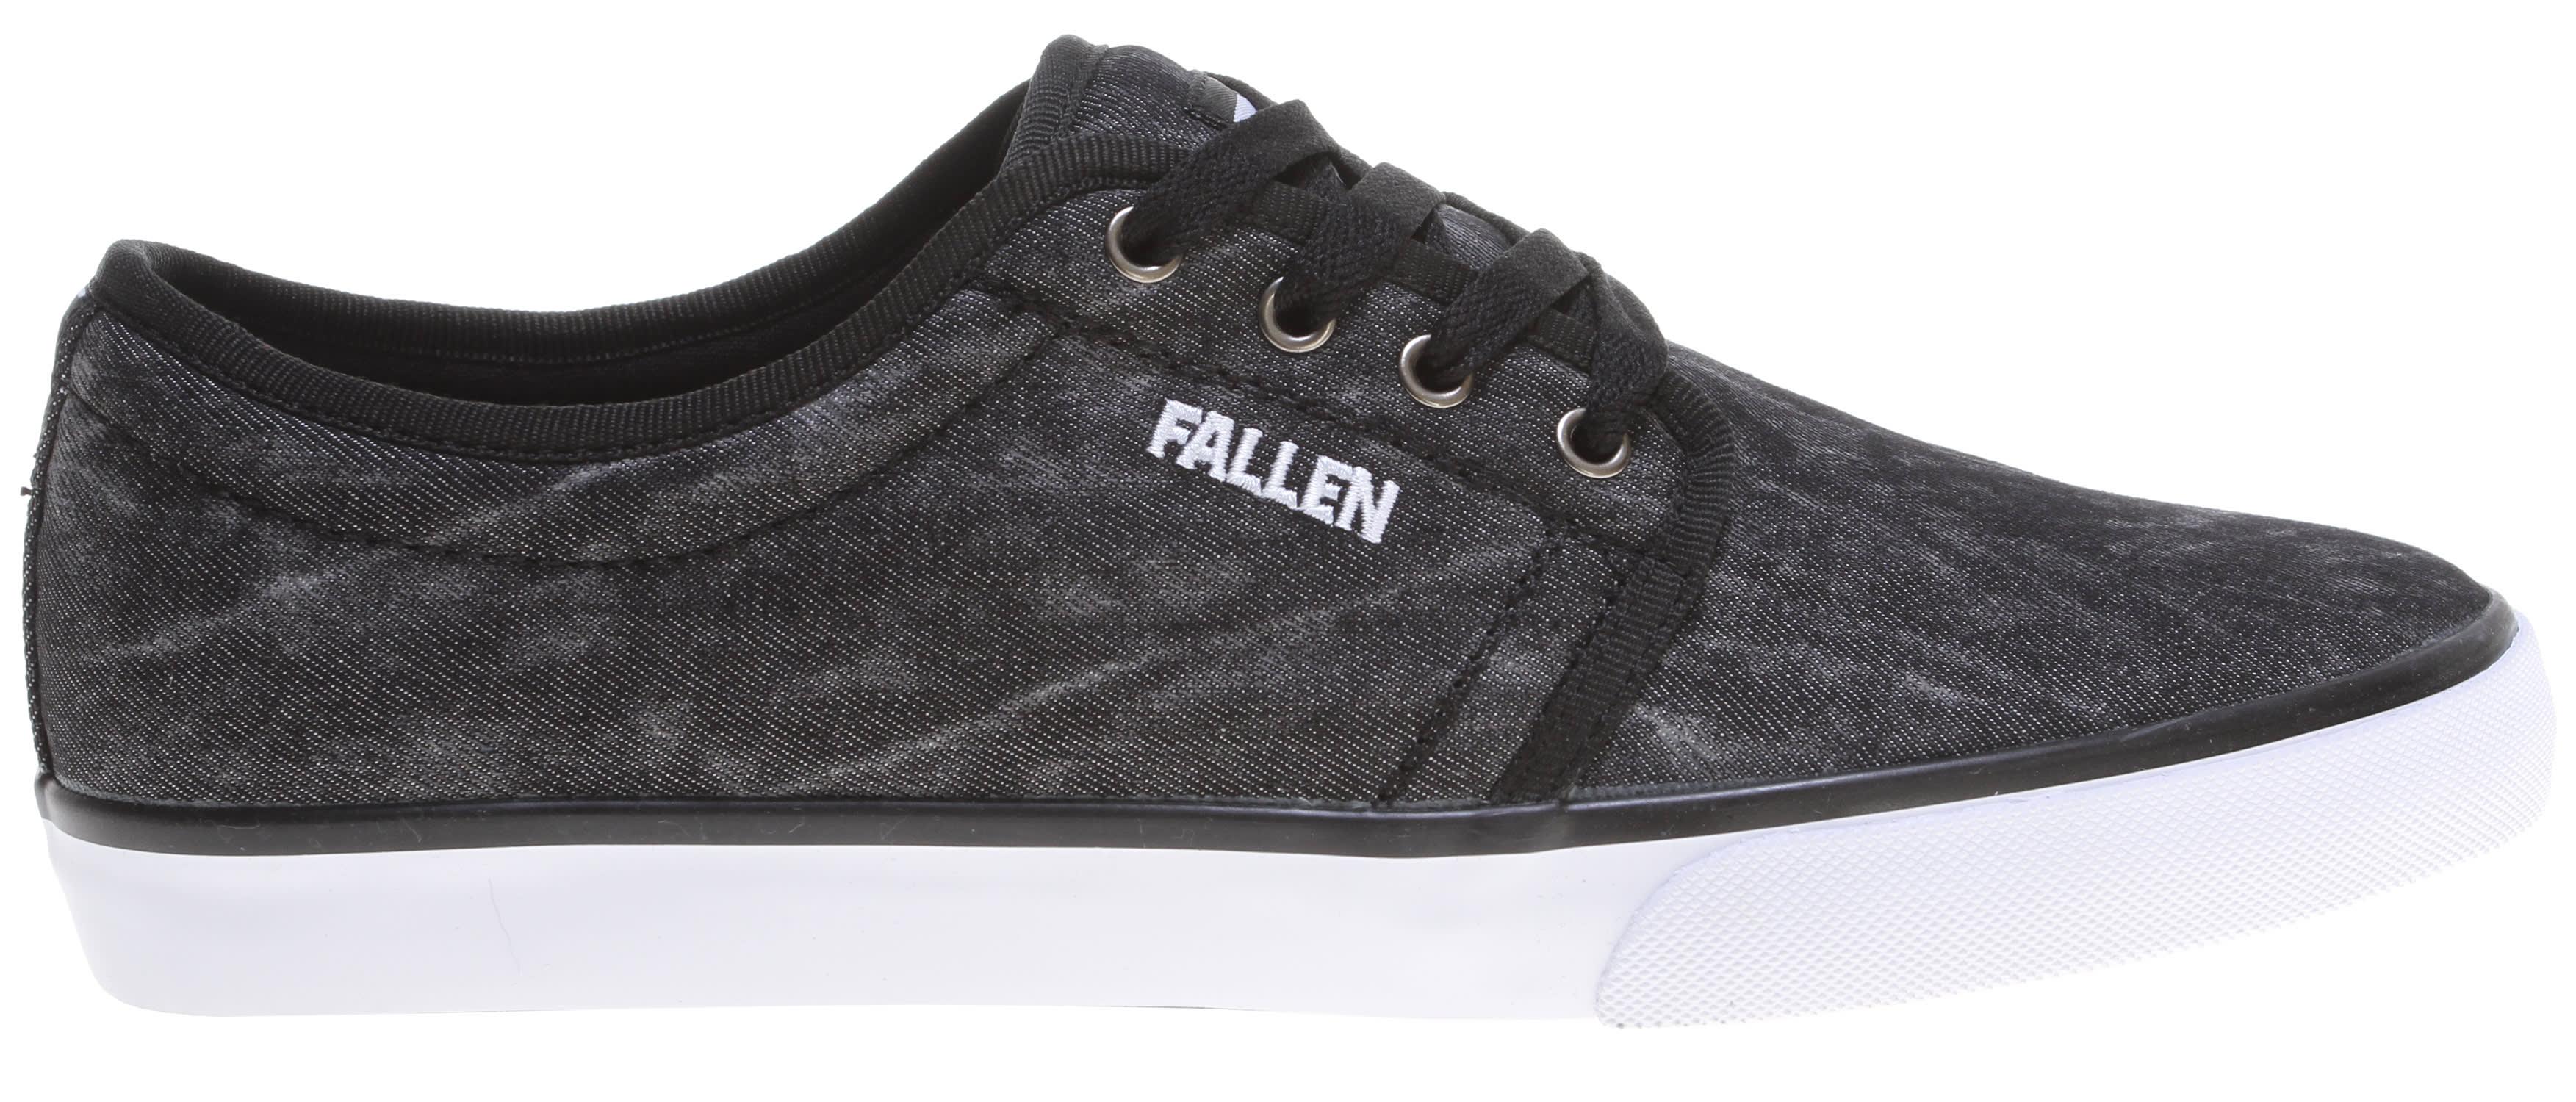 36a4c2a775 Fallen Forte II Skate Shoes - thumbnail 1